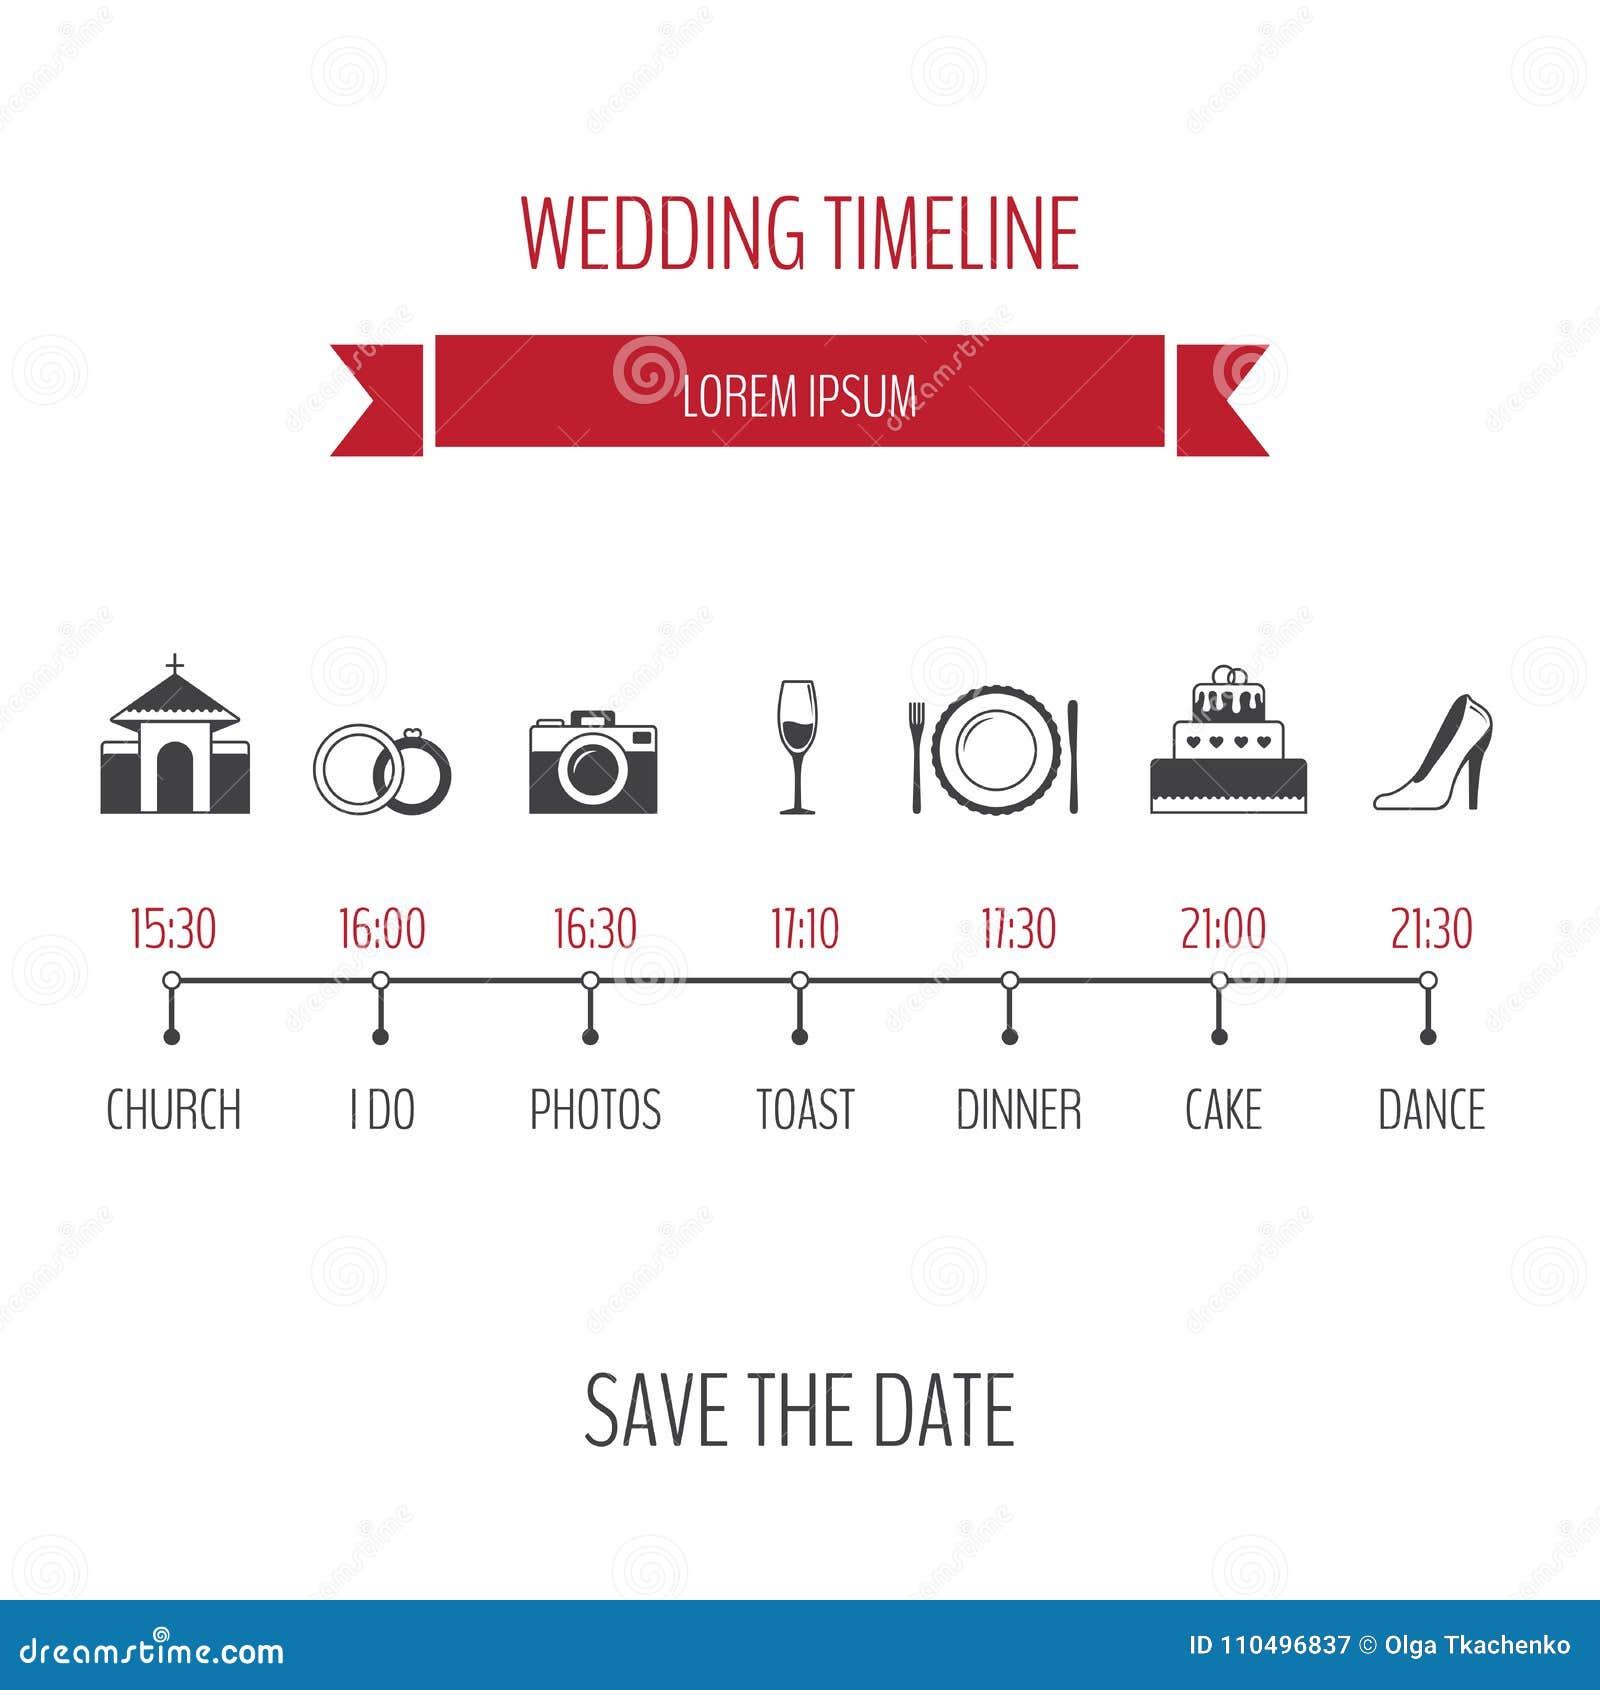 Wedding Invitation Timeline: Wedding Timeline Infographic. Vector Illustration, Flat